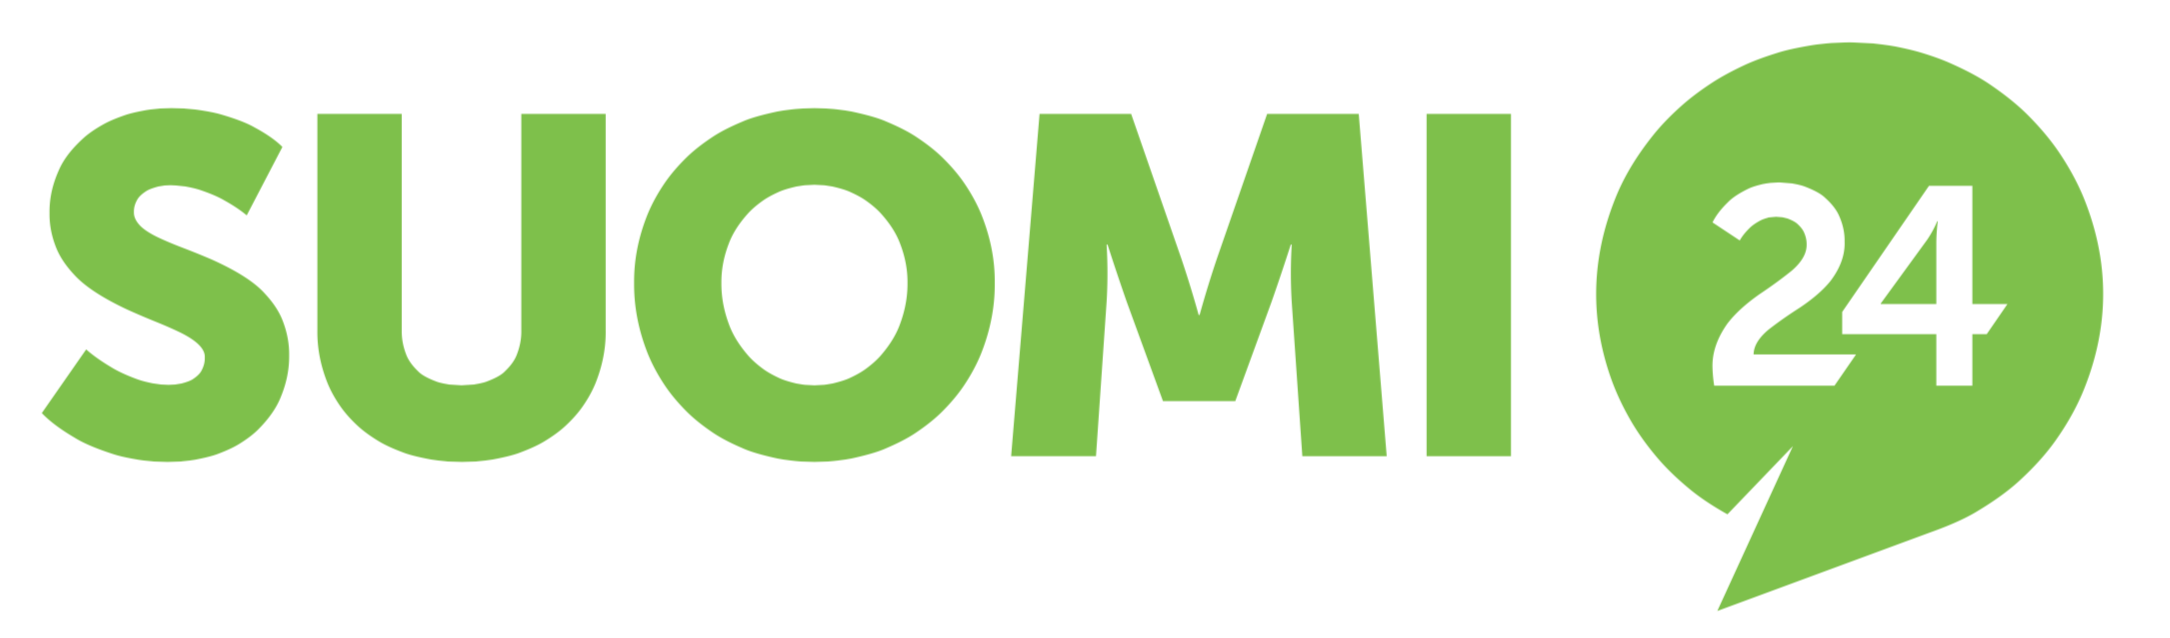 Suomi24.fi logo